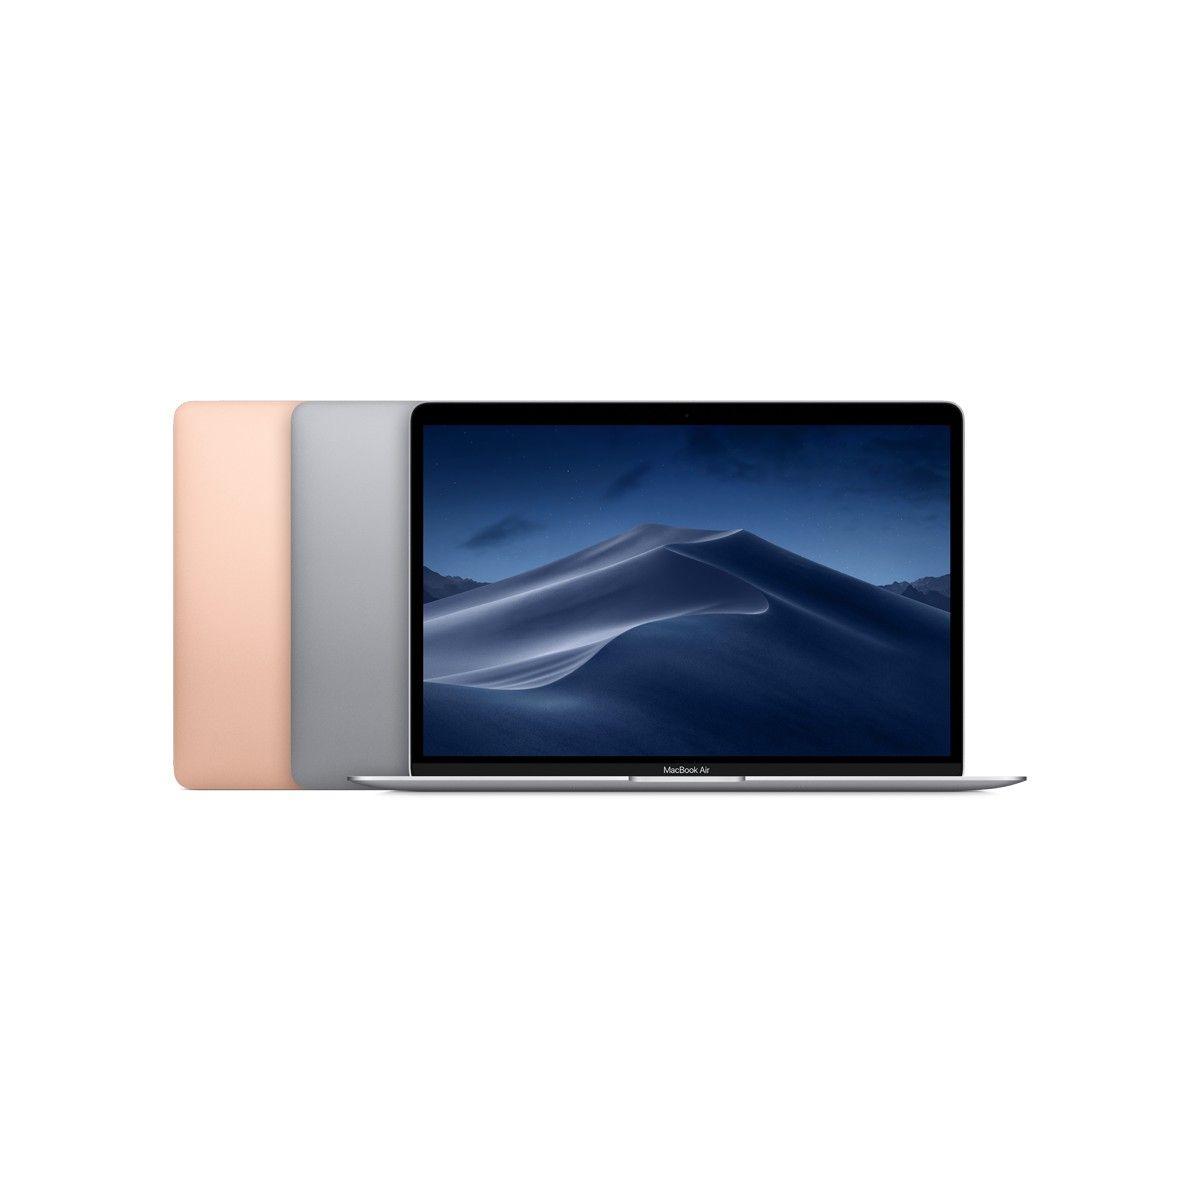 buy Macbook Air (CTO) online in india best prices